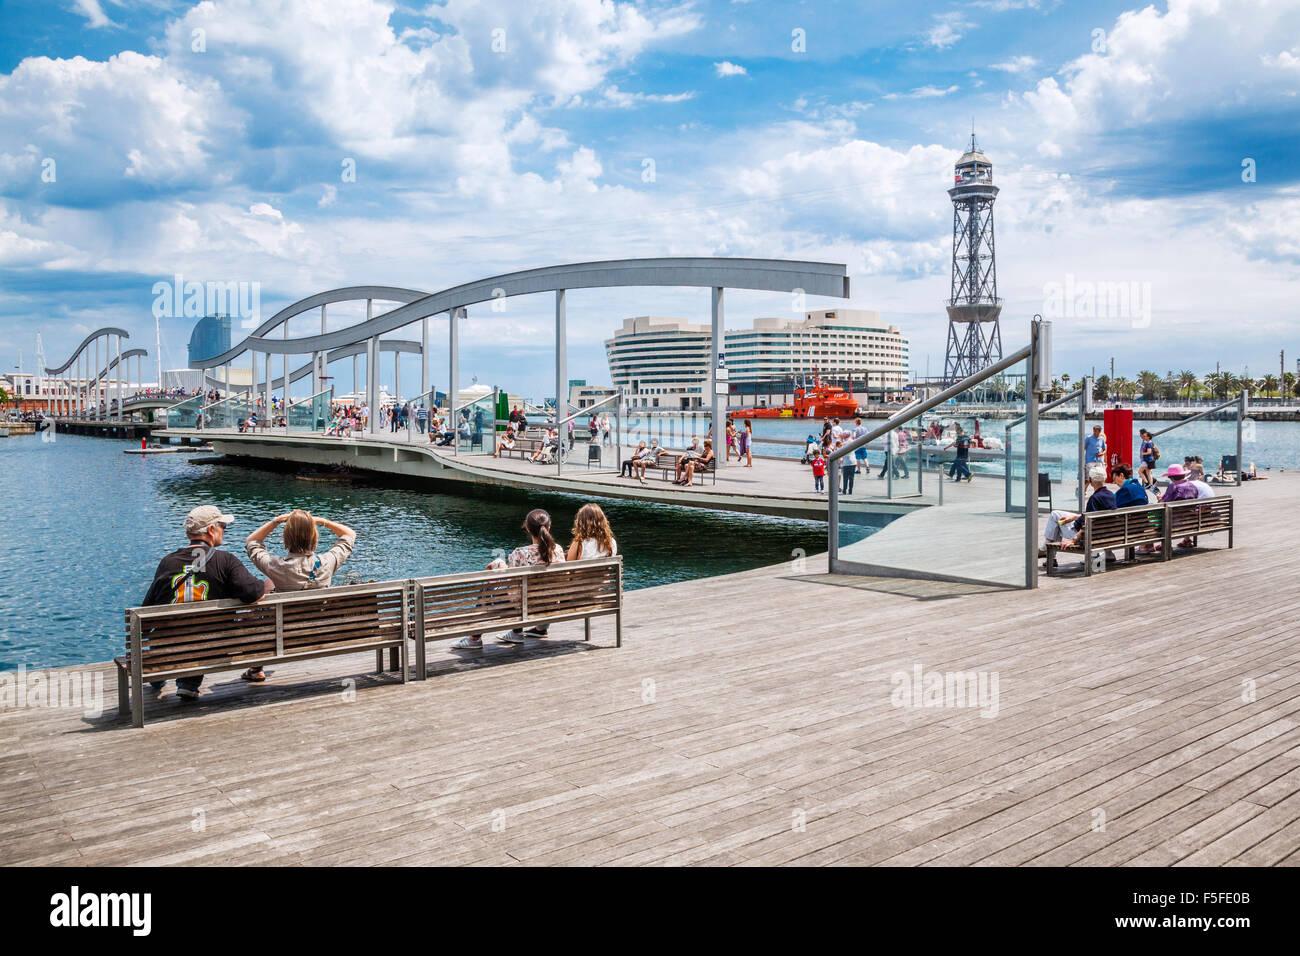 Spain, Catatonia, Barcelona, Port Vell, Rambla del Mar, - Stock Image